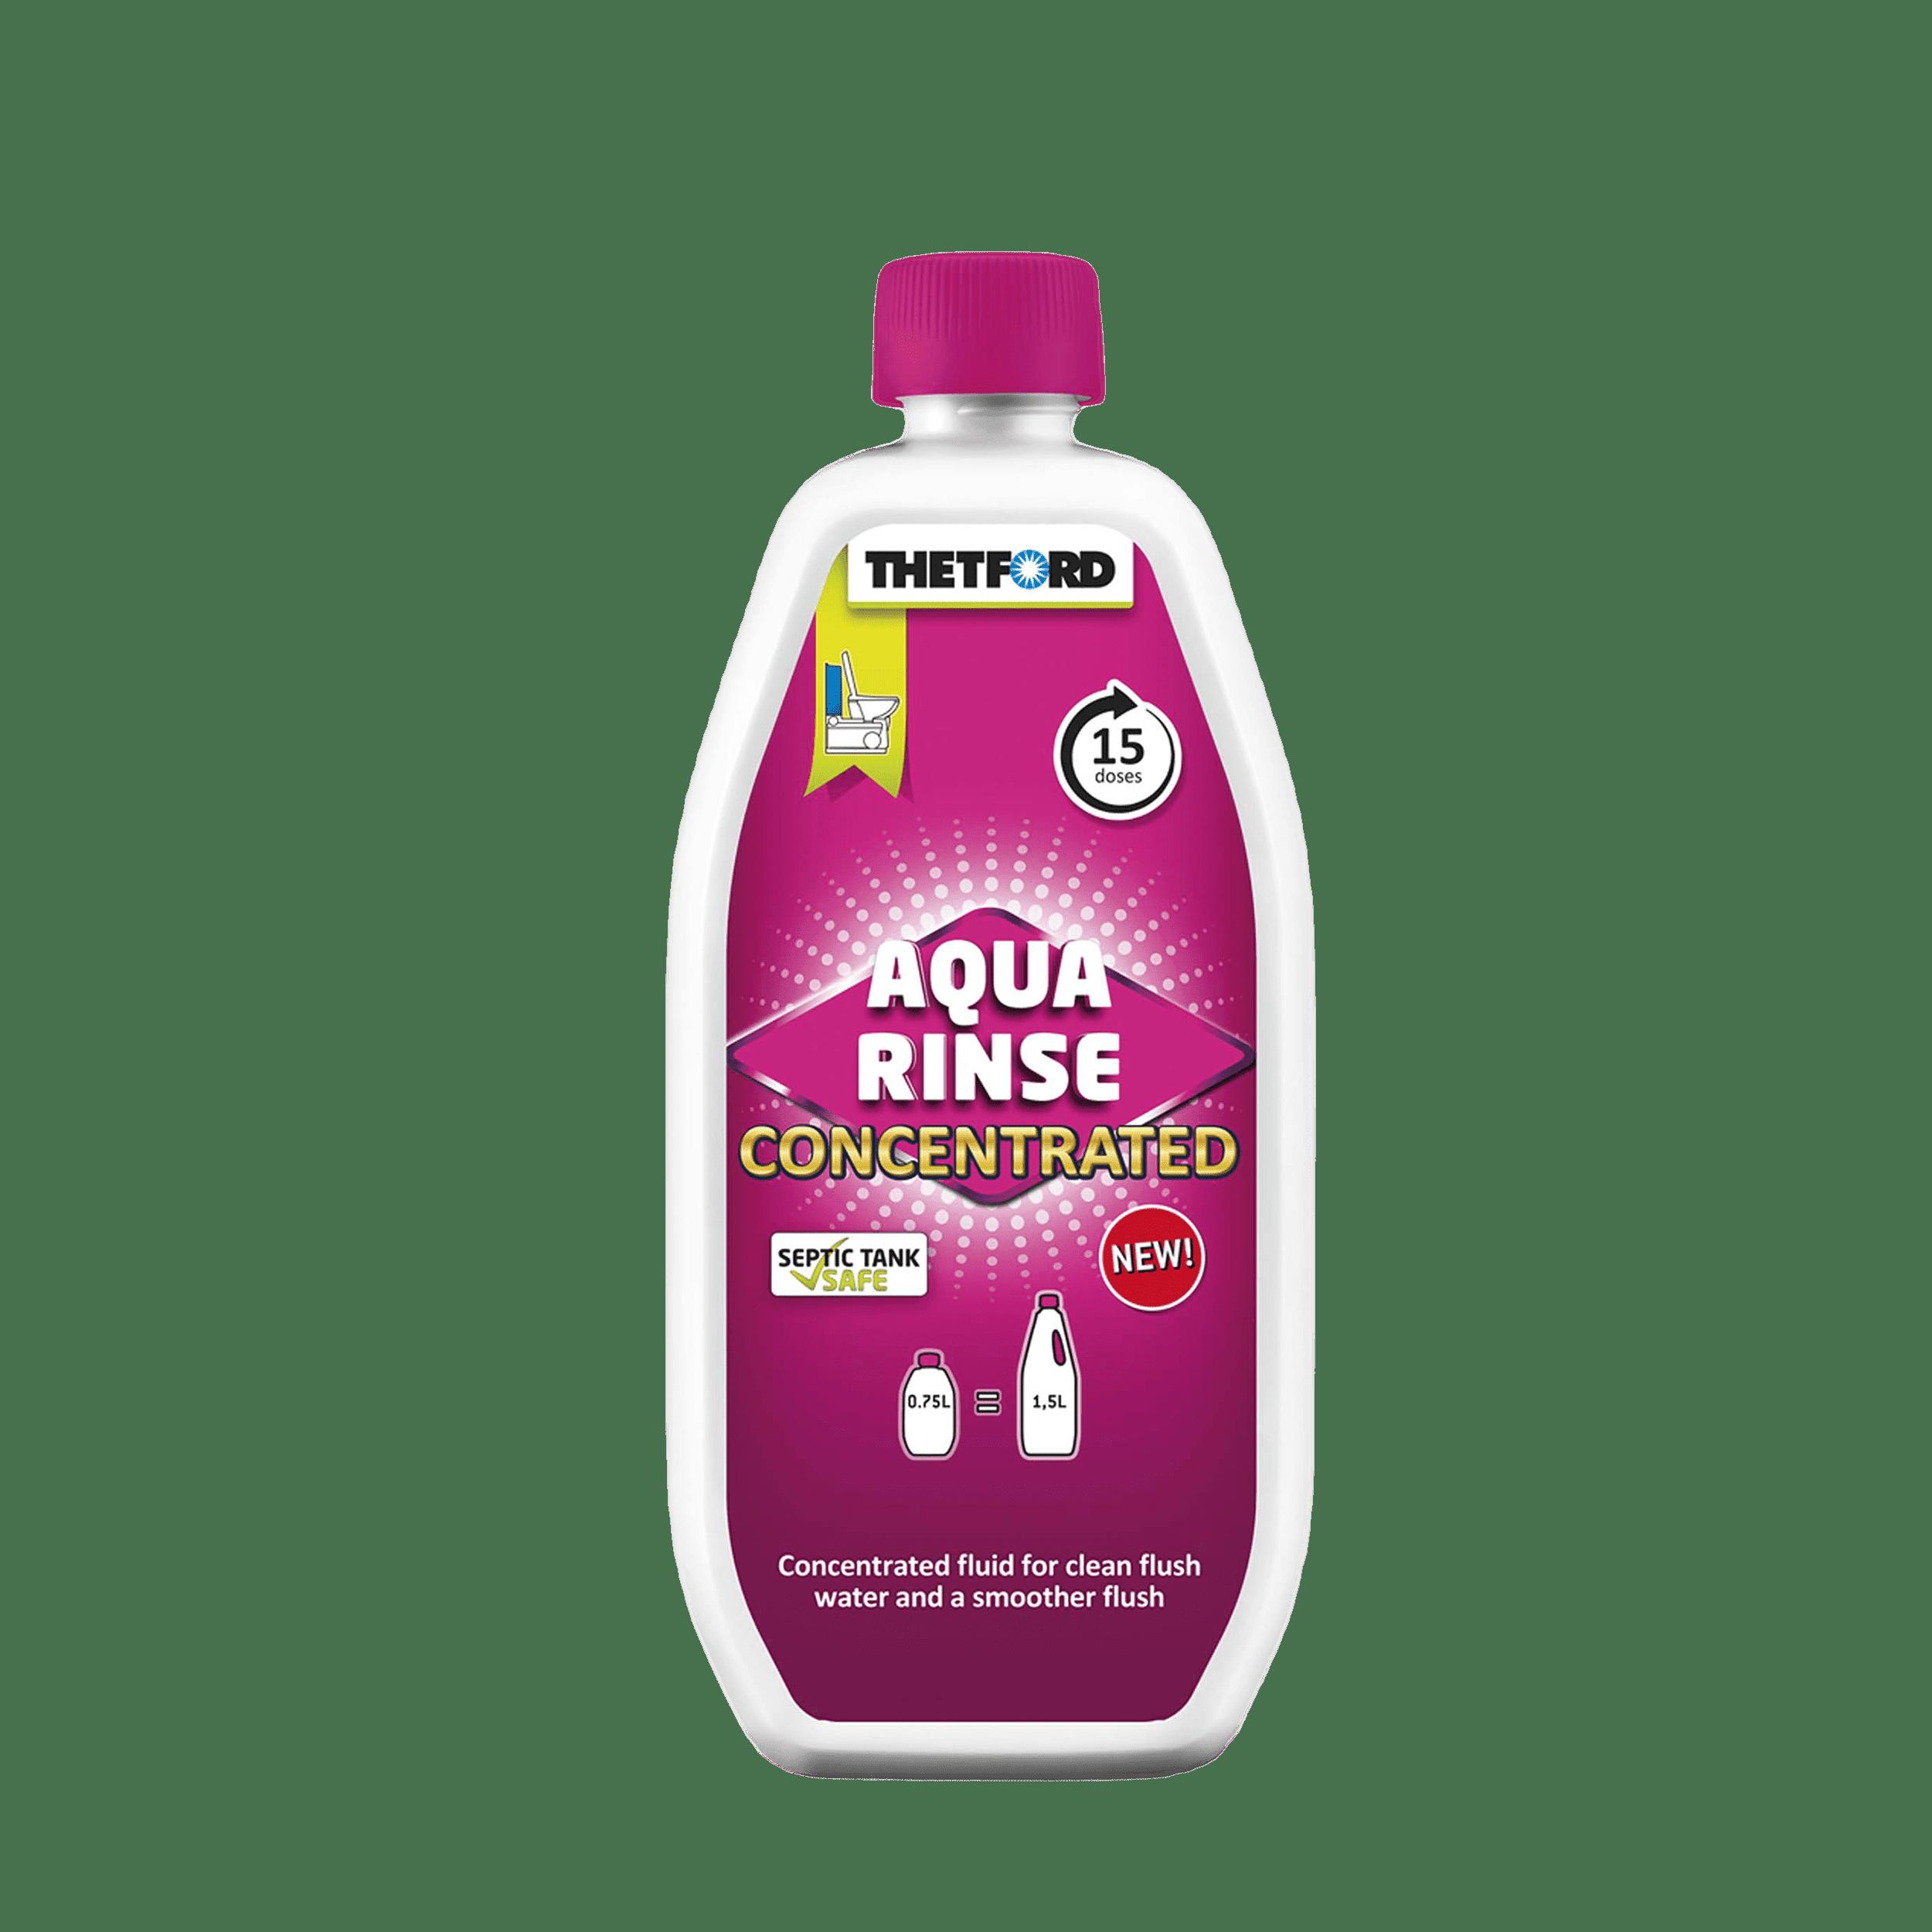 Aqua rinse concentrated 750ml